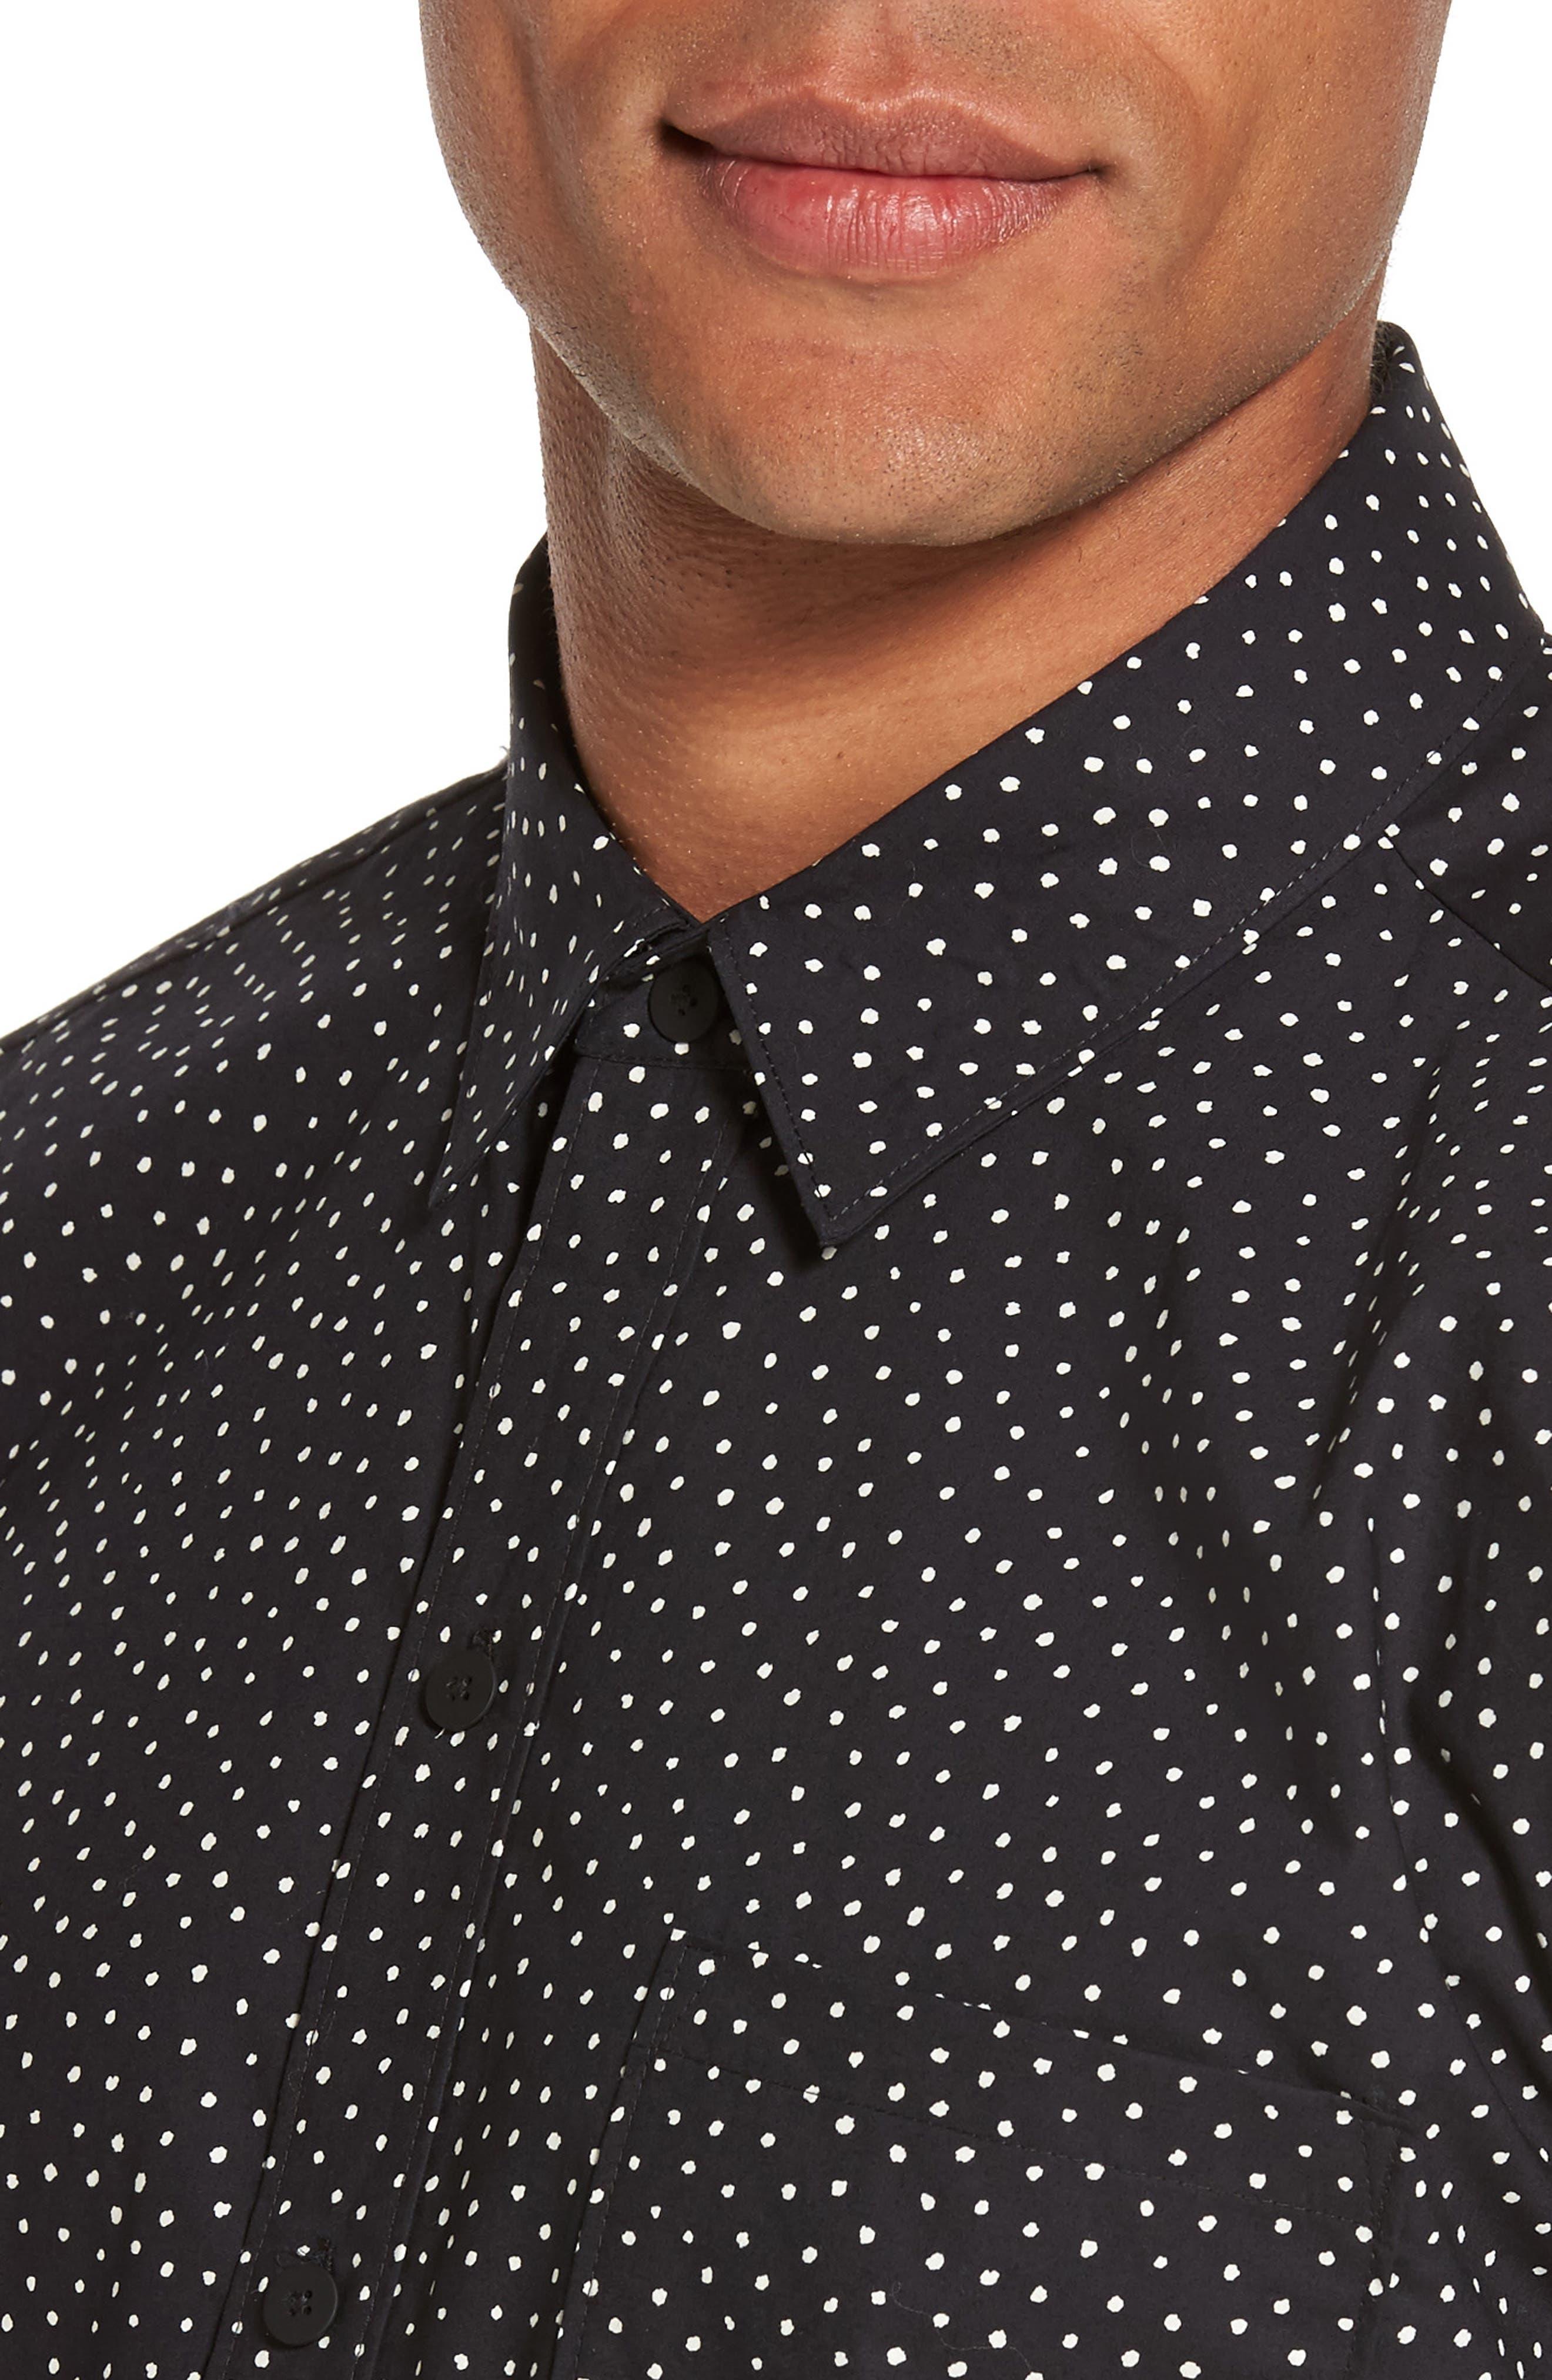 Becker Dot Print Woven Shirt,                             Alternate thumbnail 7, color,